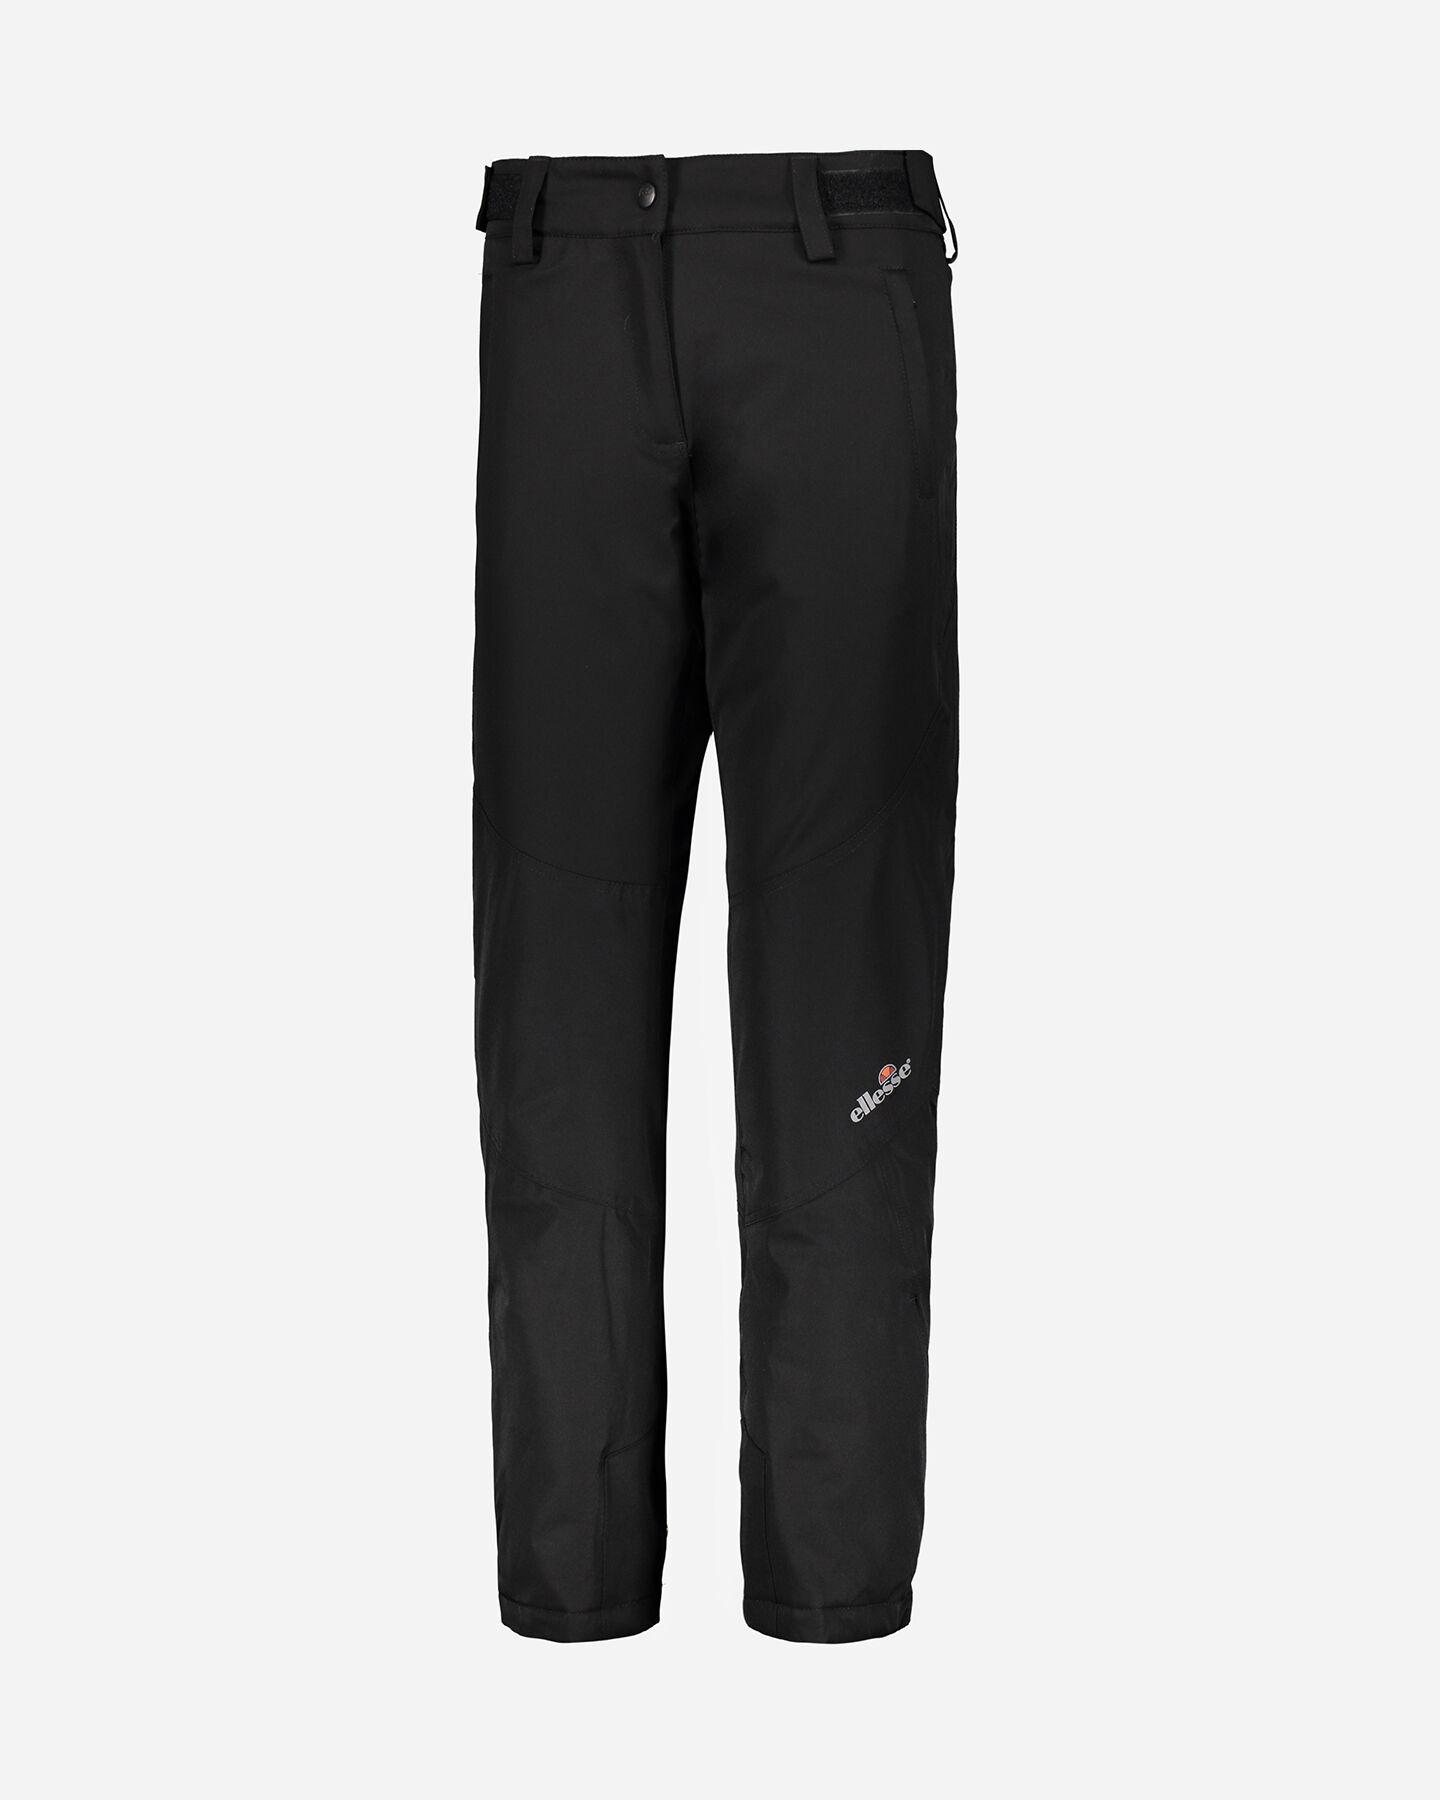 Pantalone sci ELLESSE SKI PANT W S4029977 scatto 4